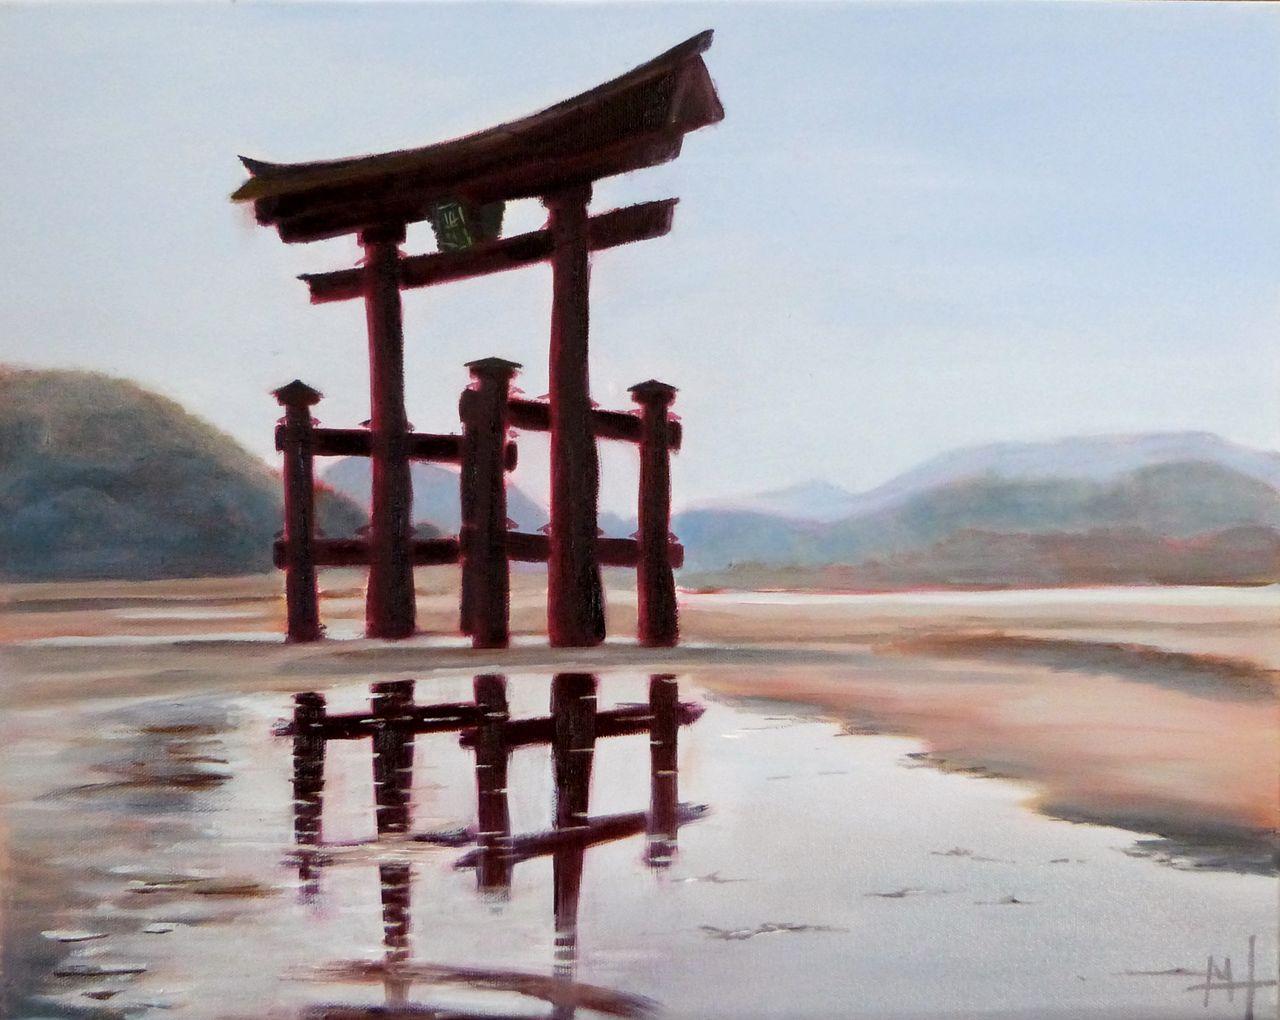 Marie-Hélène CLINCHAMPS le grand Torii de Miyajima